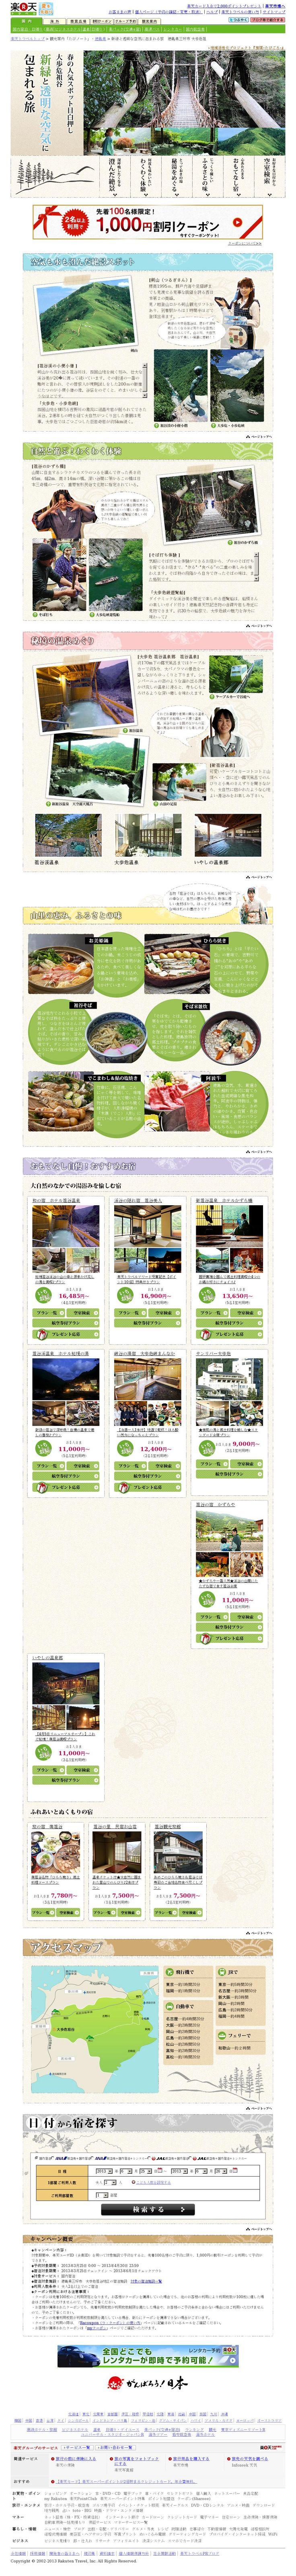 【D】【旅頃】徳島県三好市 春の人気スポット目白押し! 大歩危祖谷で新緑と透明な空気に包まれる<2013/03/25>